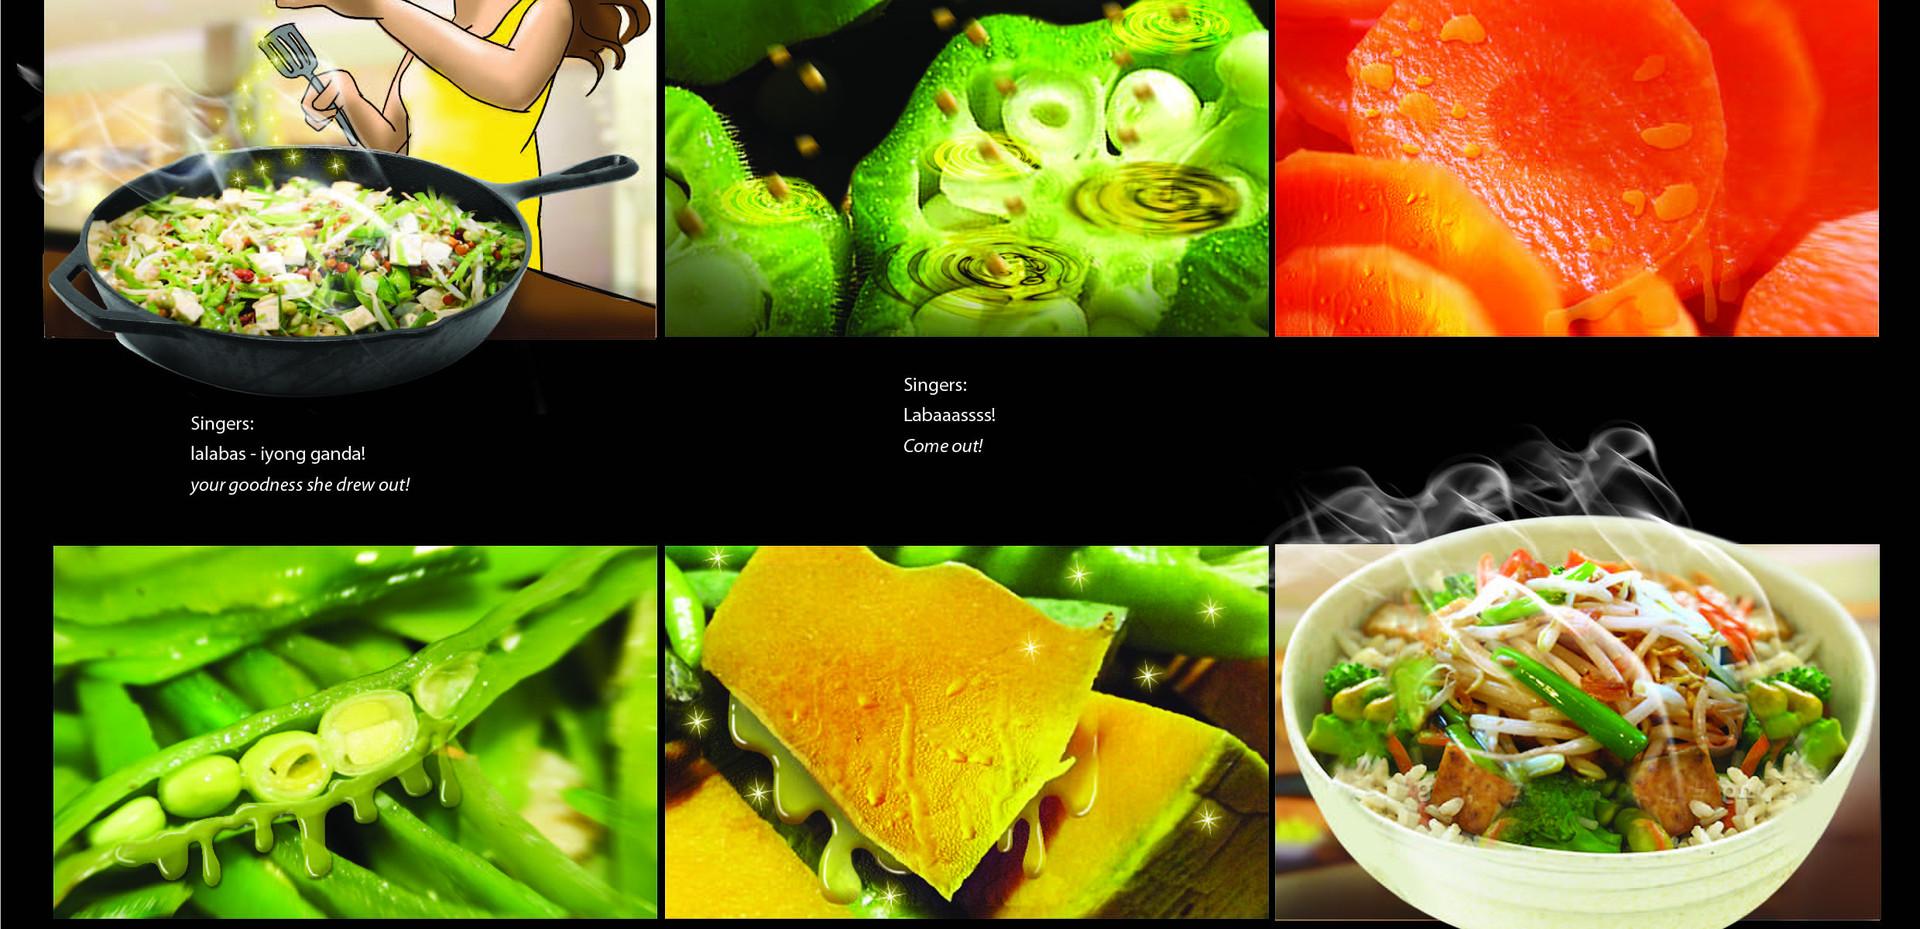 7-09-2014 MMS Q3 Storyboard-02.jpg